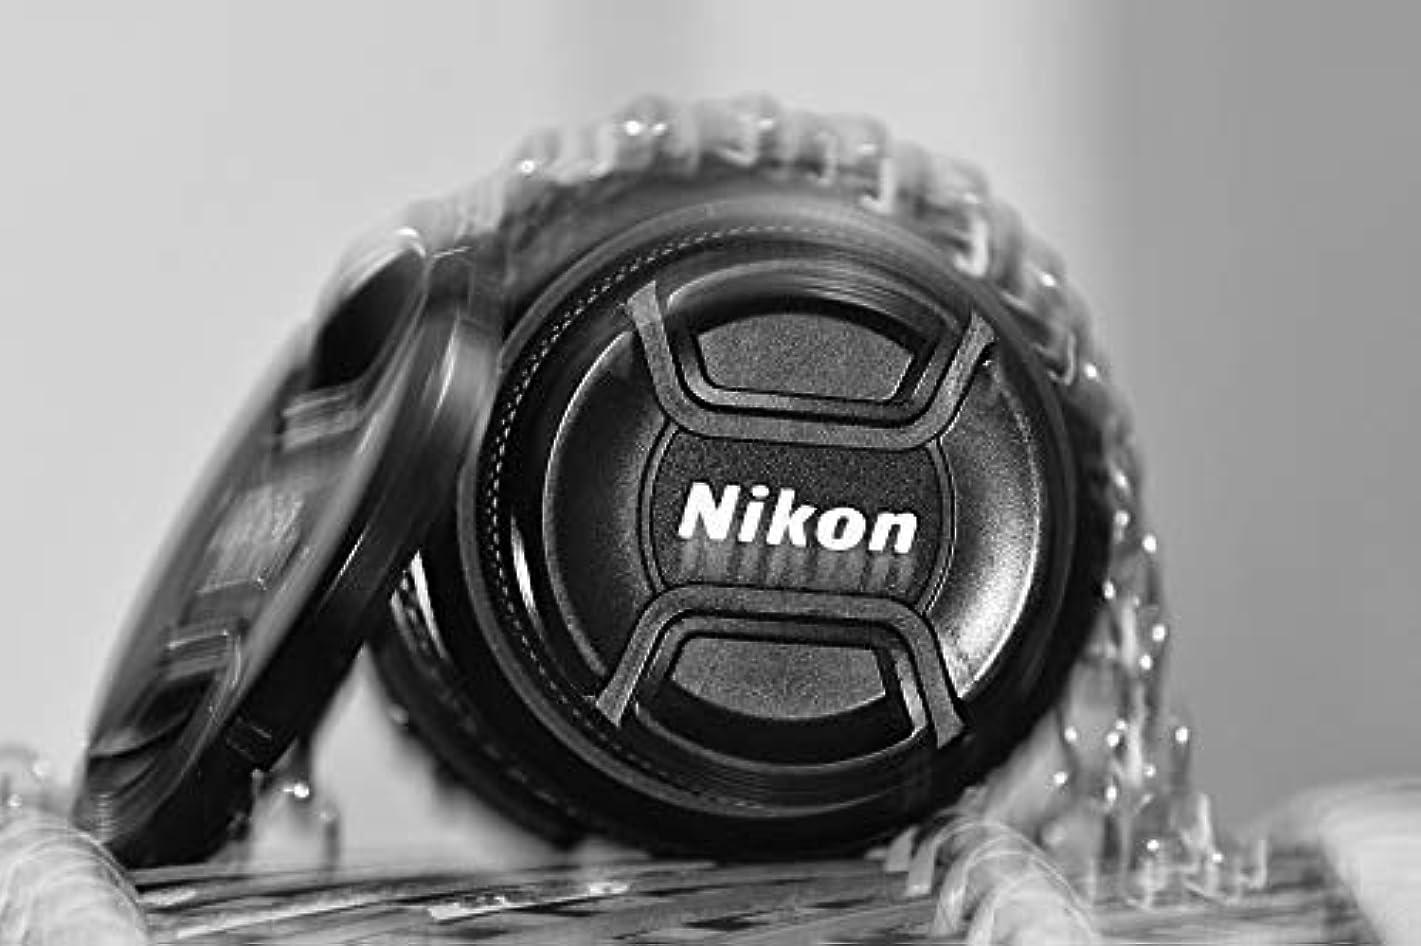 Home Comforts Canvas Print Lens Nikon Lens Lens Cap Grey Camera Nikon Vivid Imagery Stretched Canvas 32 x 24